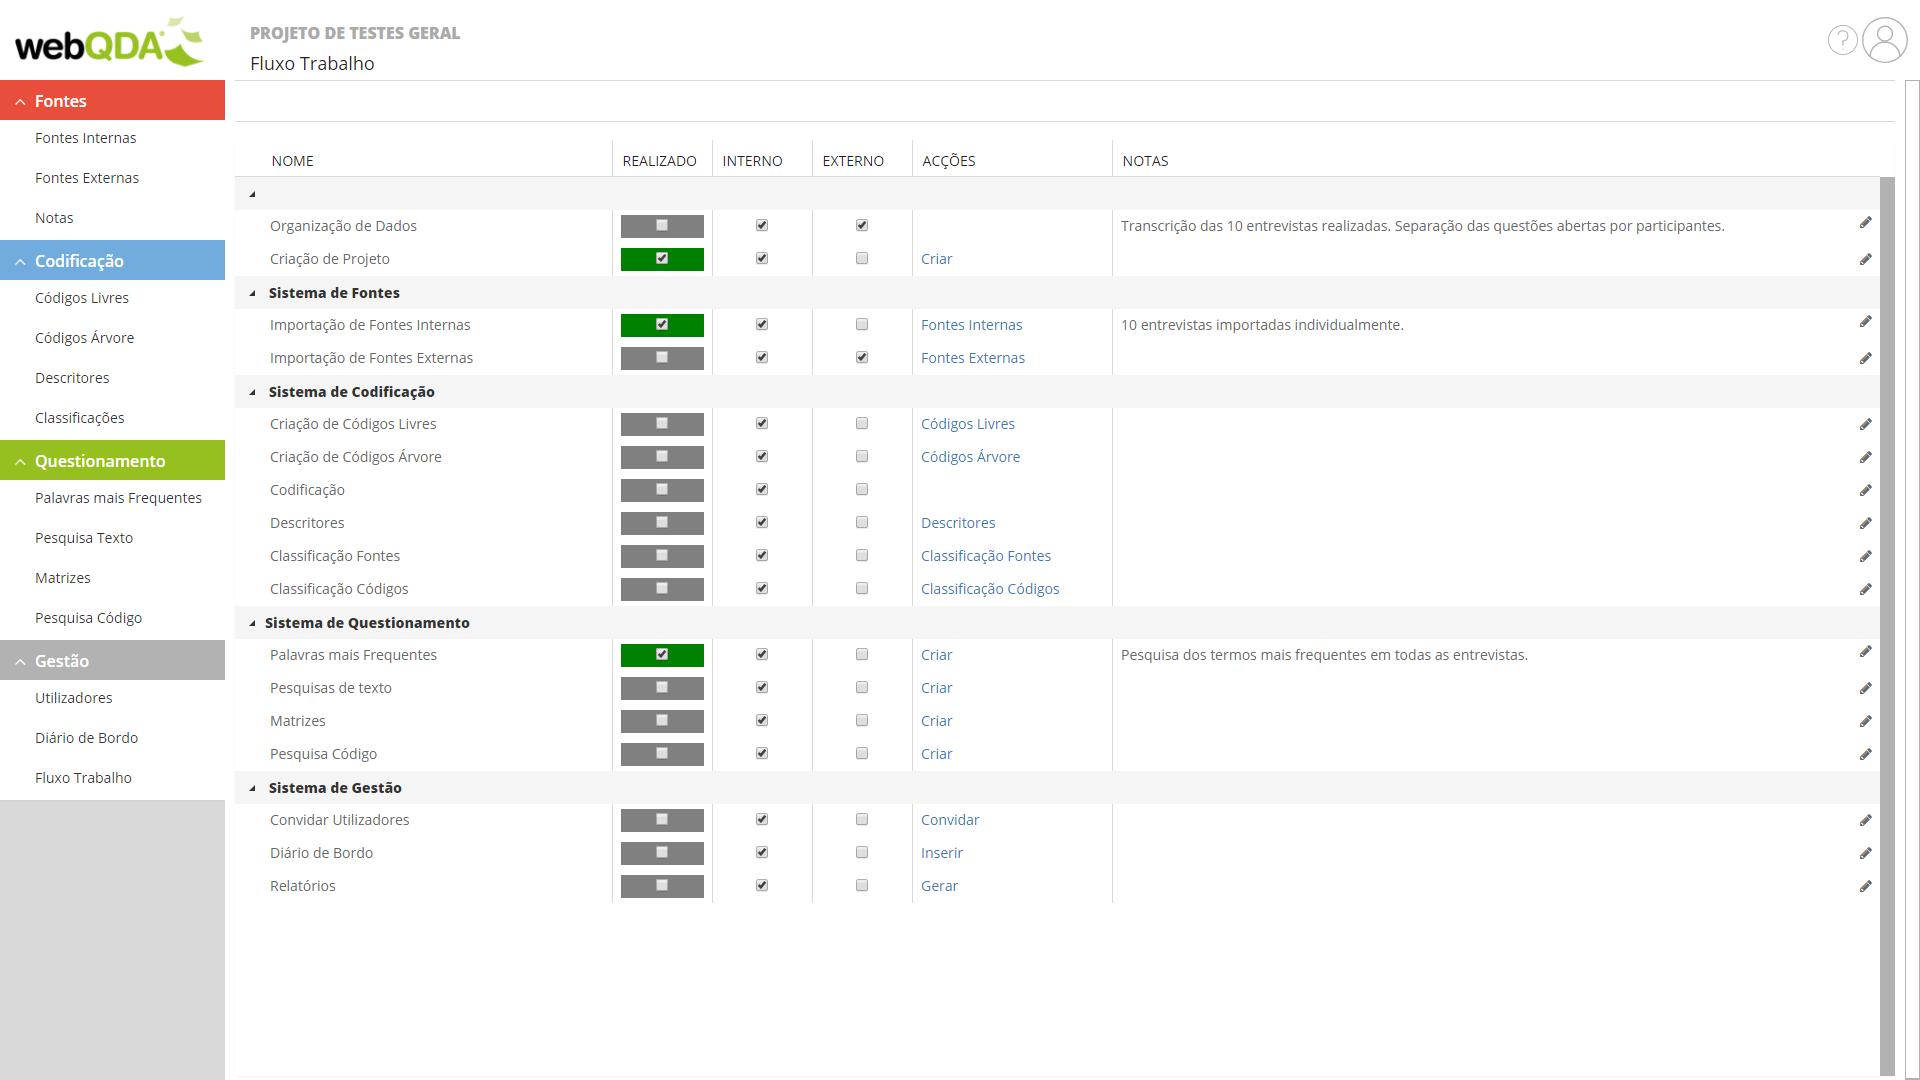 webQDA Workflow